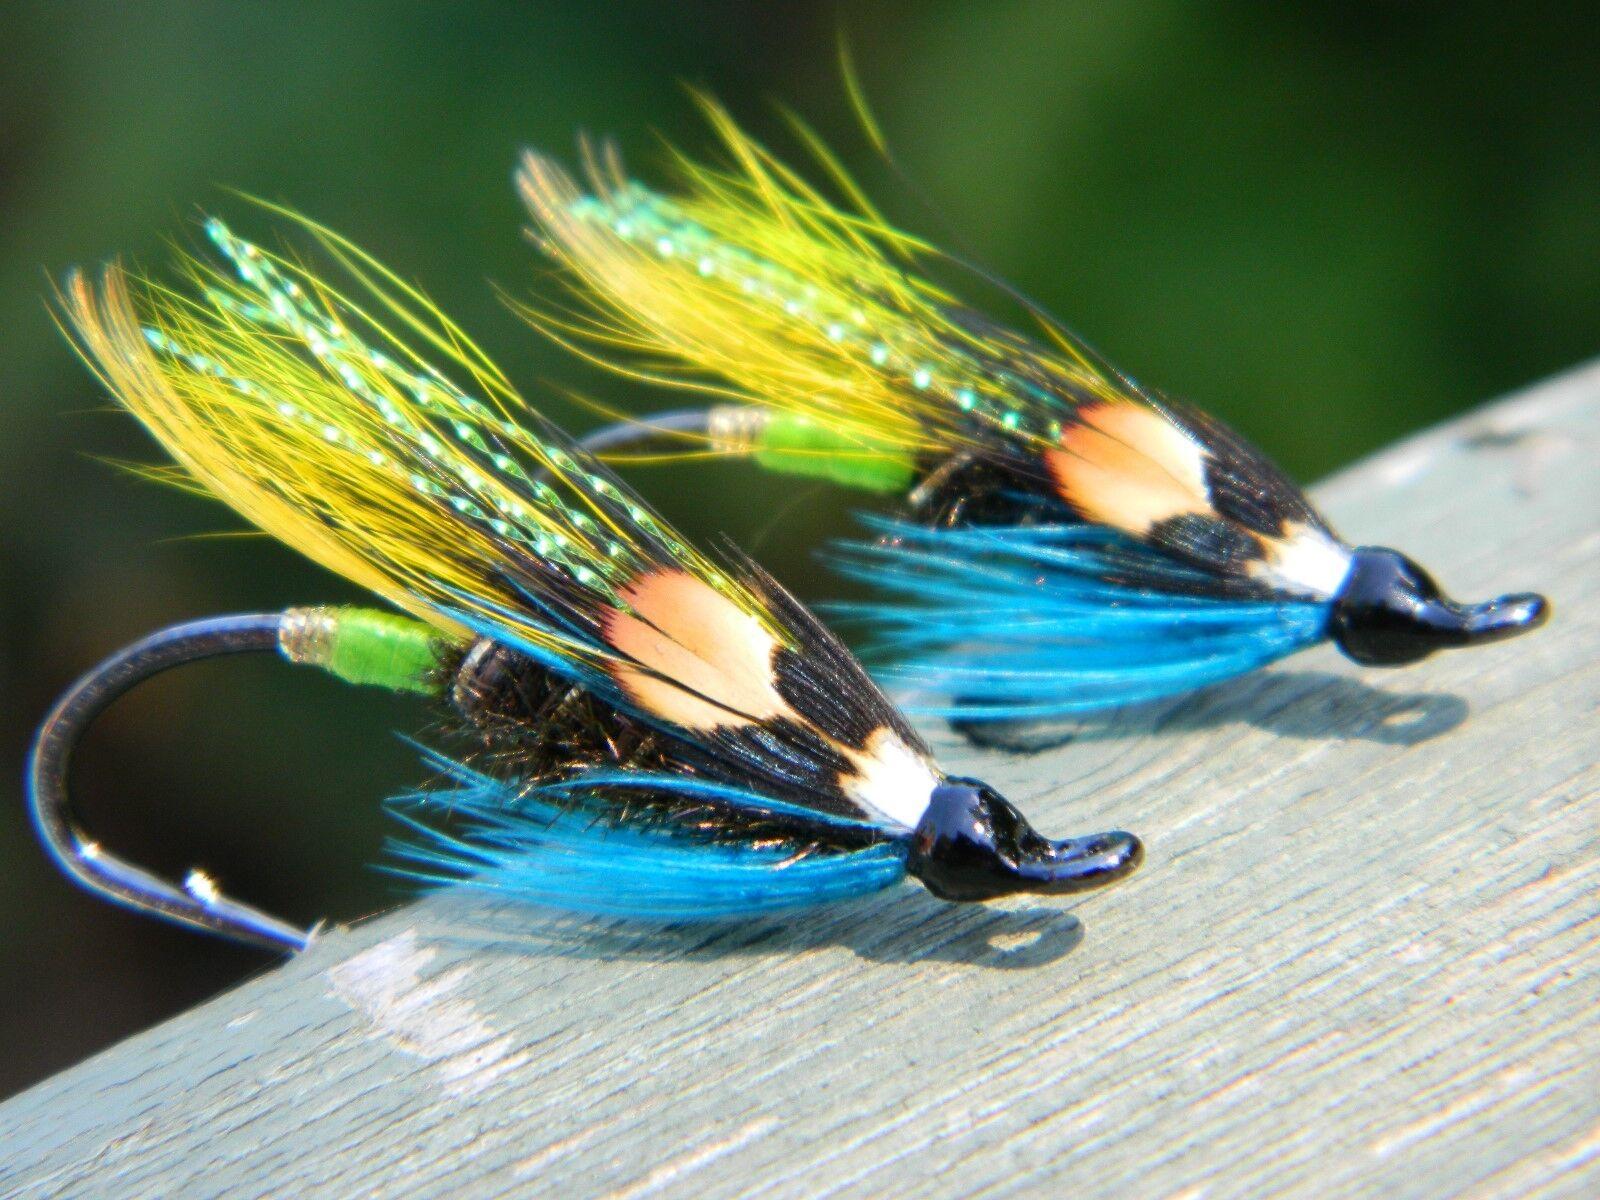 Assortment of 21 flies for rolie-the-hunter 2019-07-26